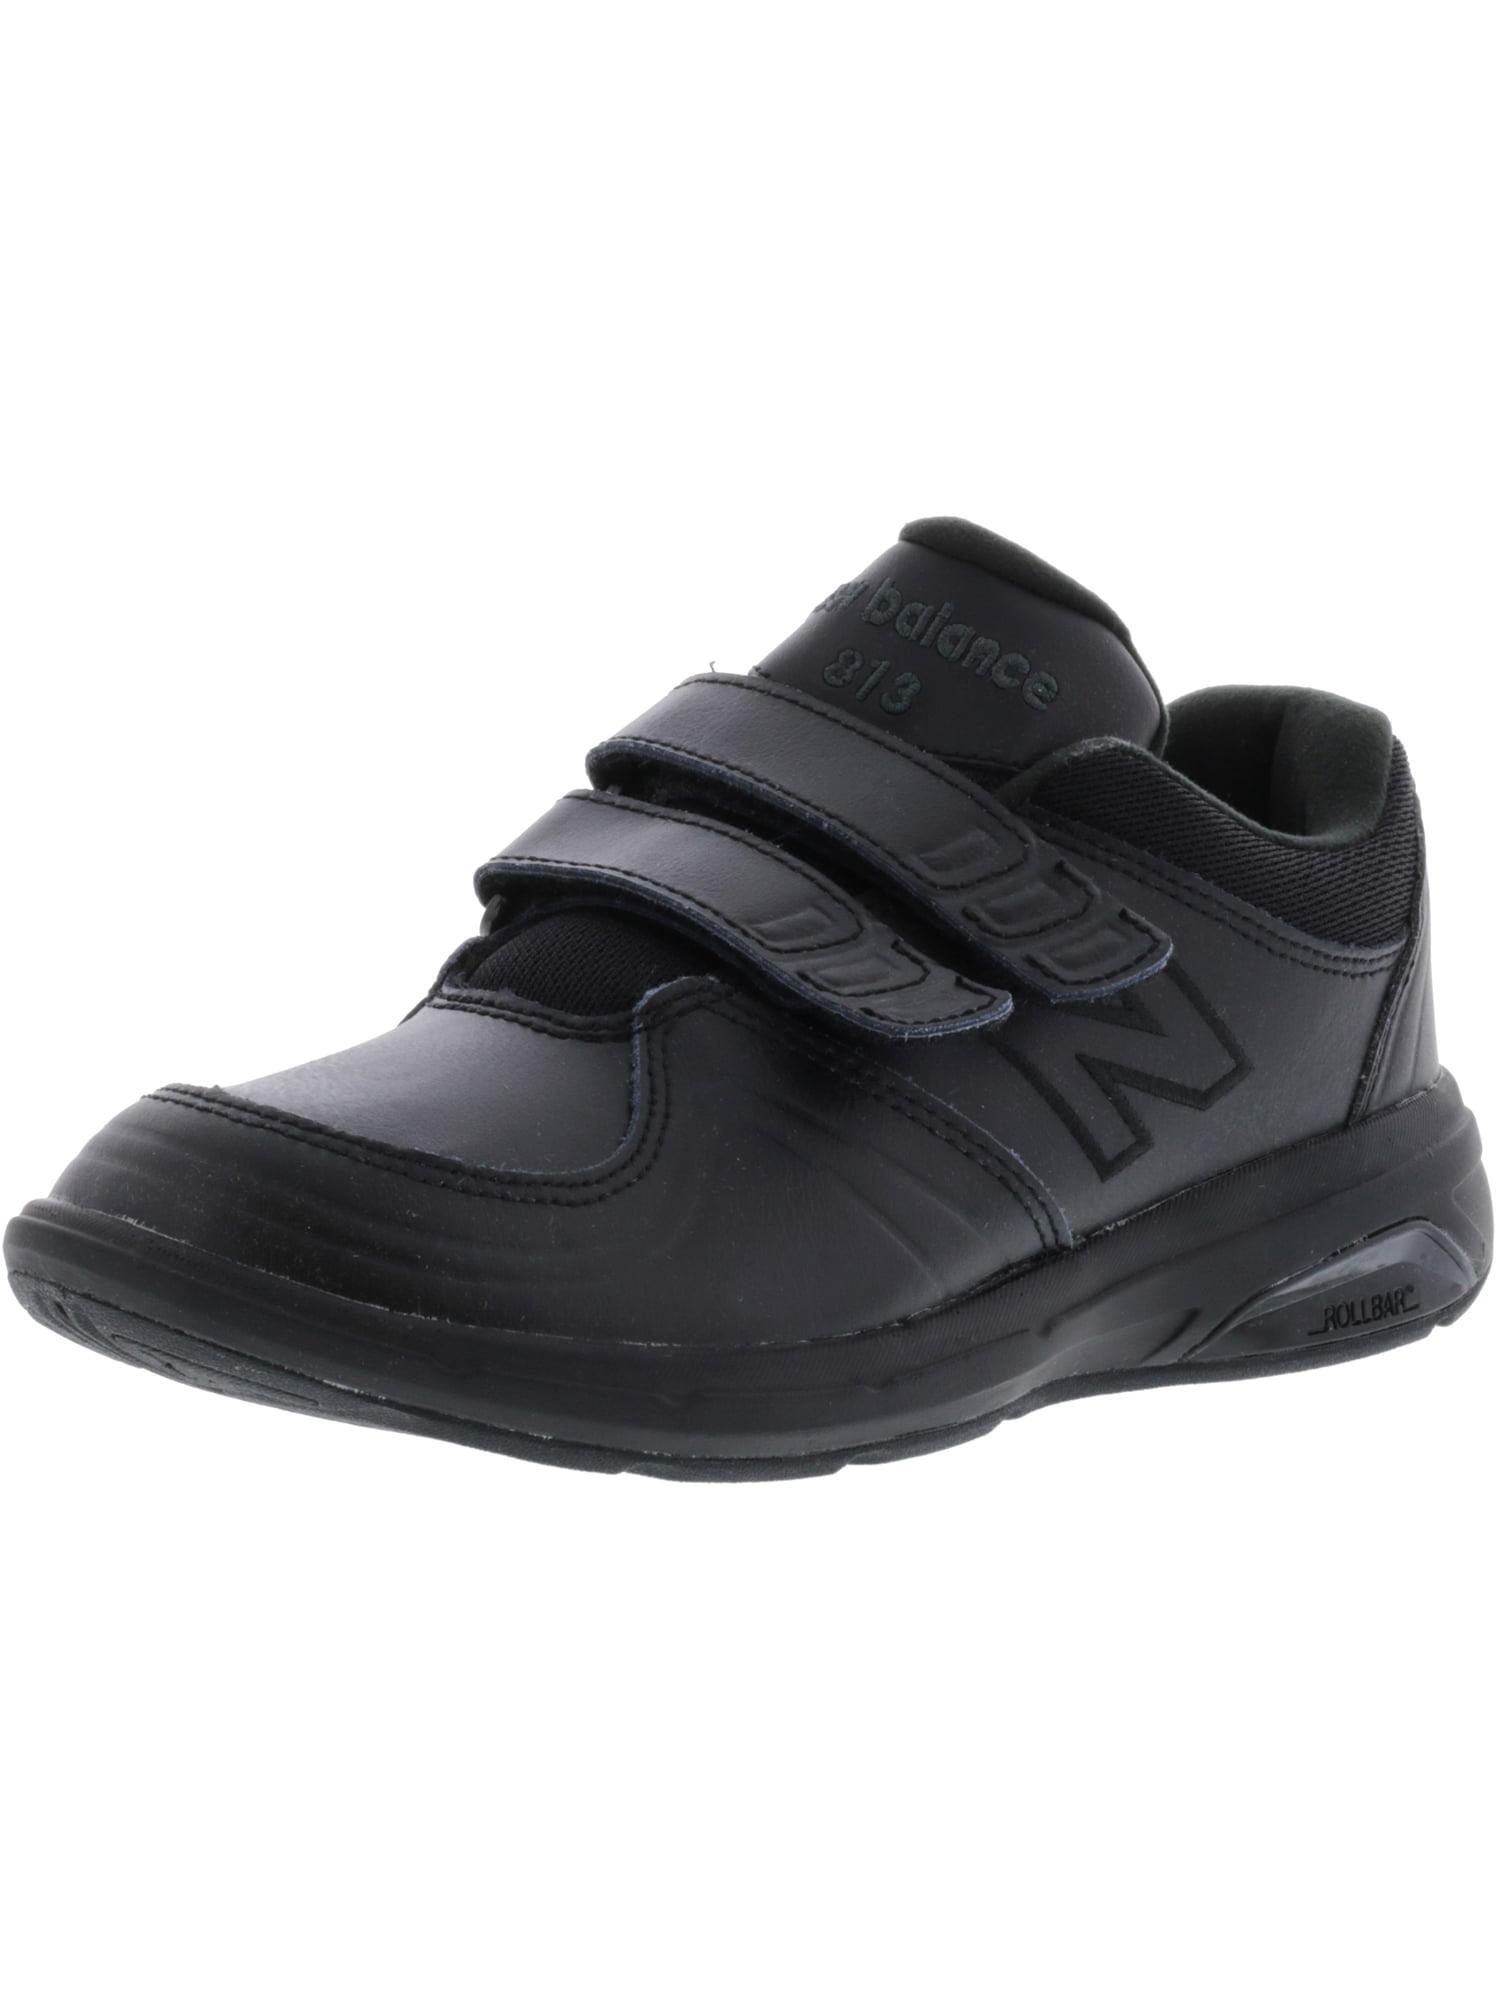 New Balance Women's Ww813 Hbk Ankle-High Leather Walking Shoe - 10M